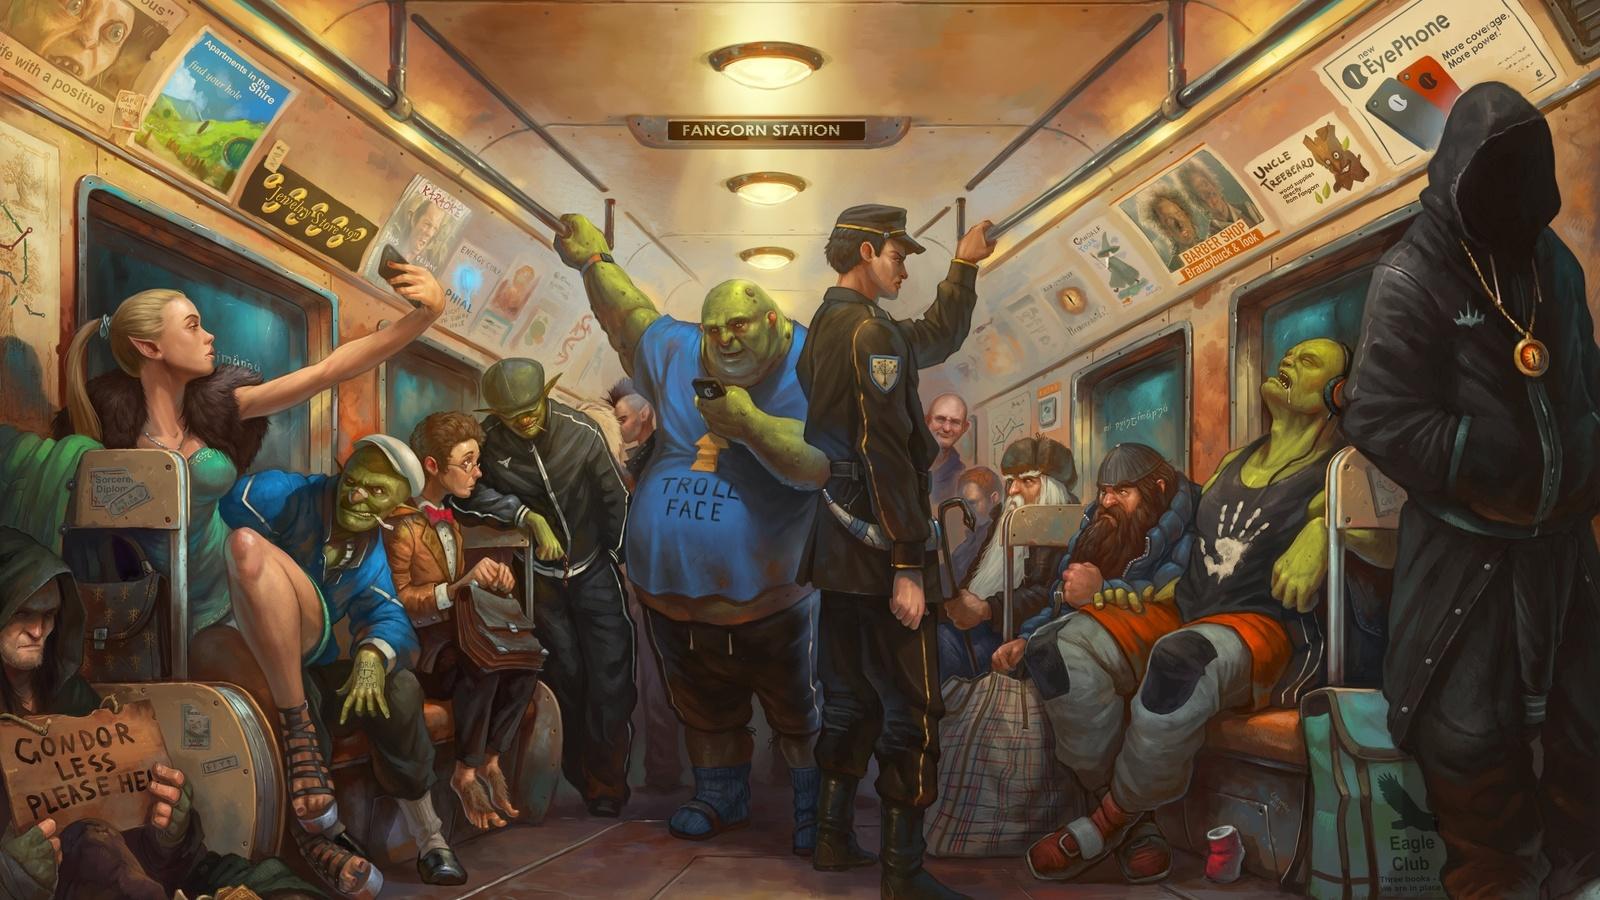 tony sart, антон Яковлев, метро, властелин колец